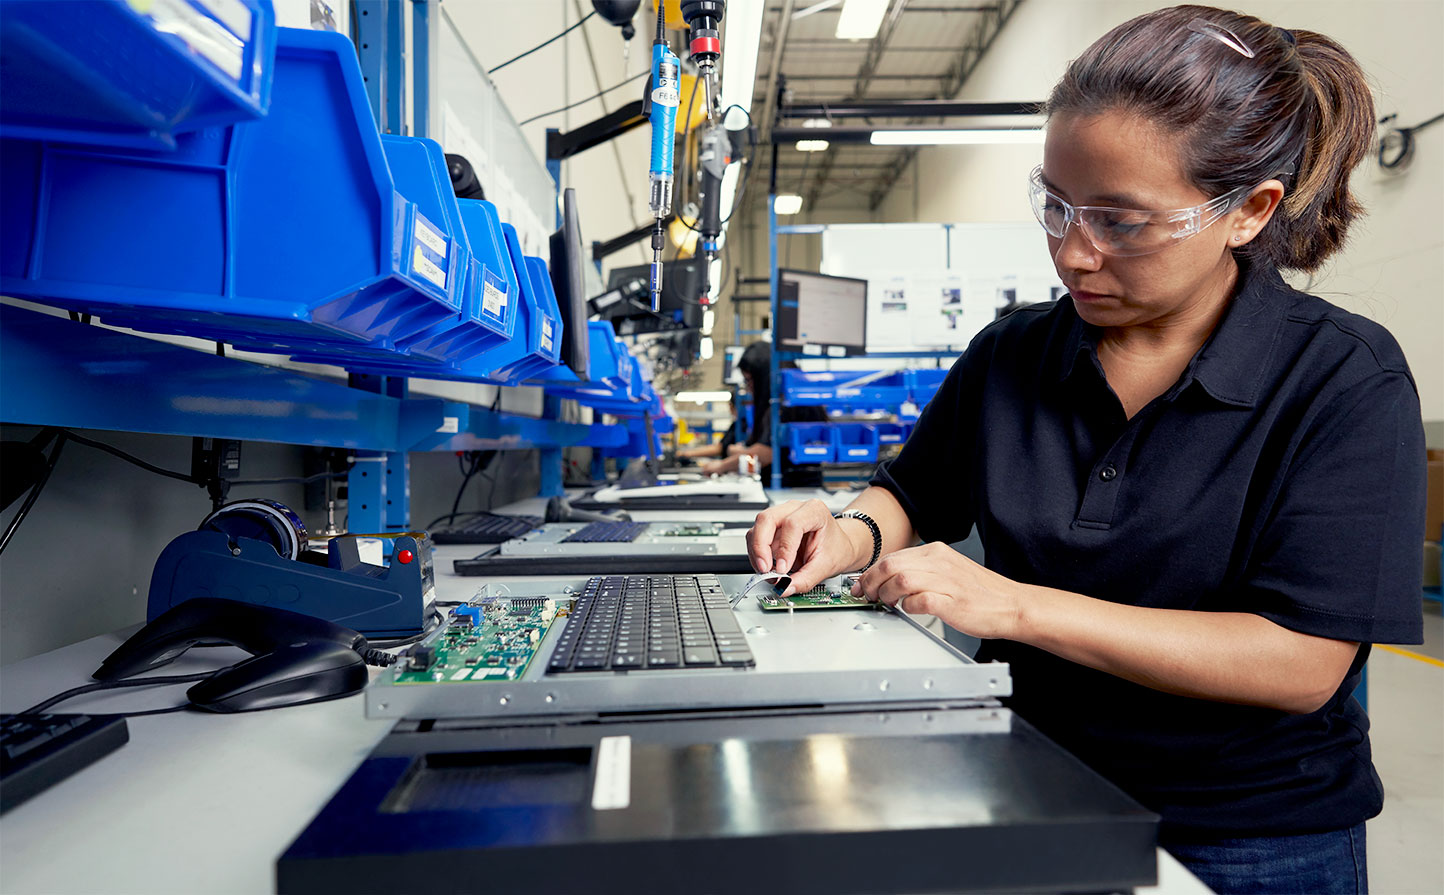 woman assembling product